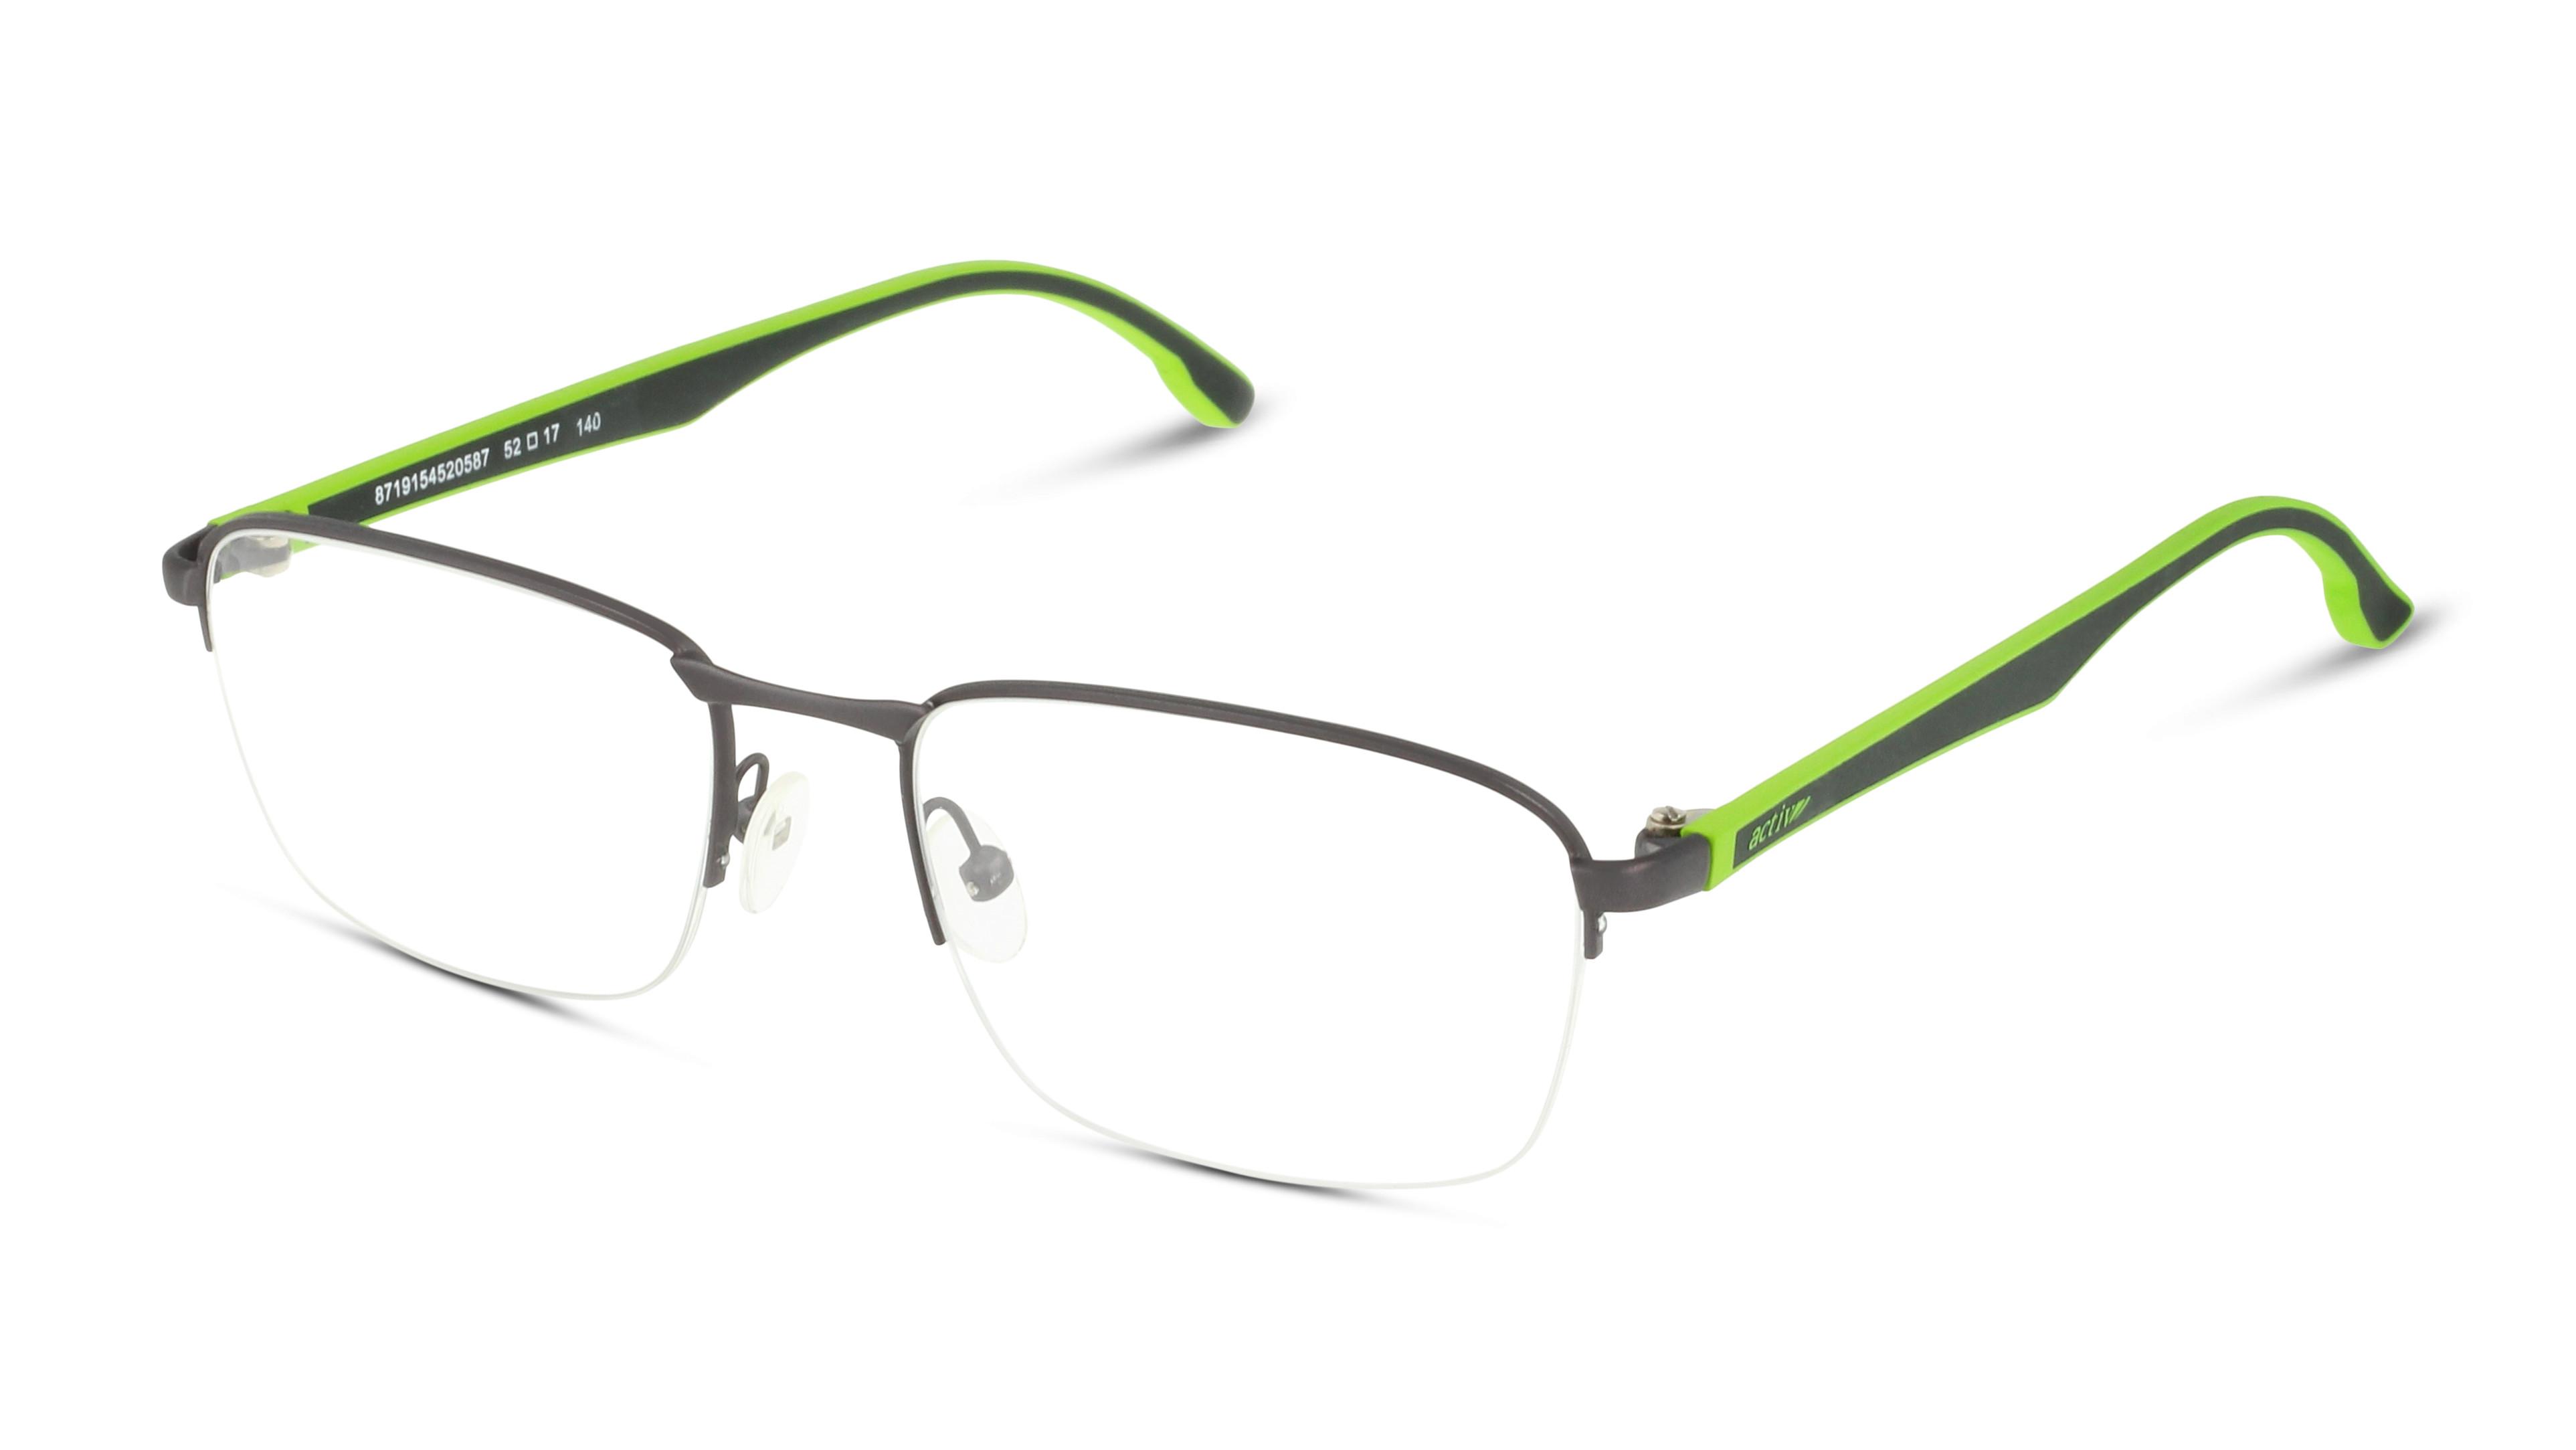 8719154520587-angle-03-activ-ackm03-eyewear-grey-green